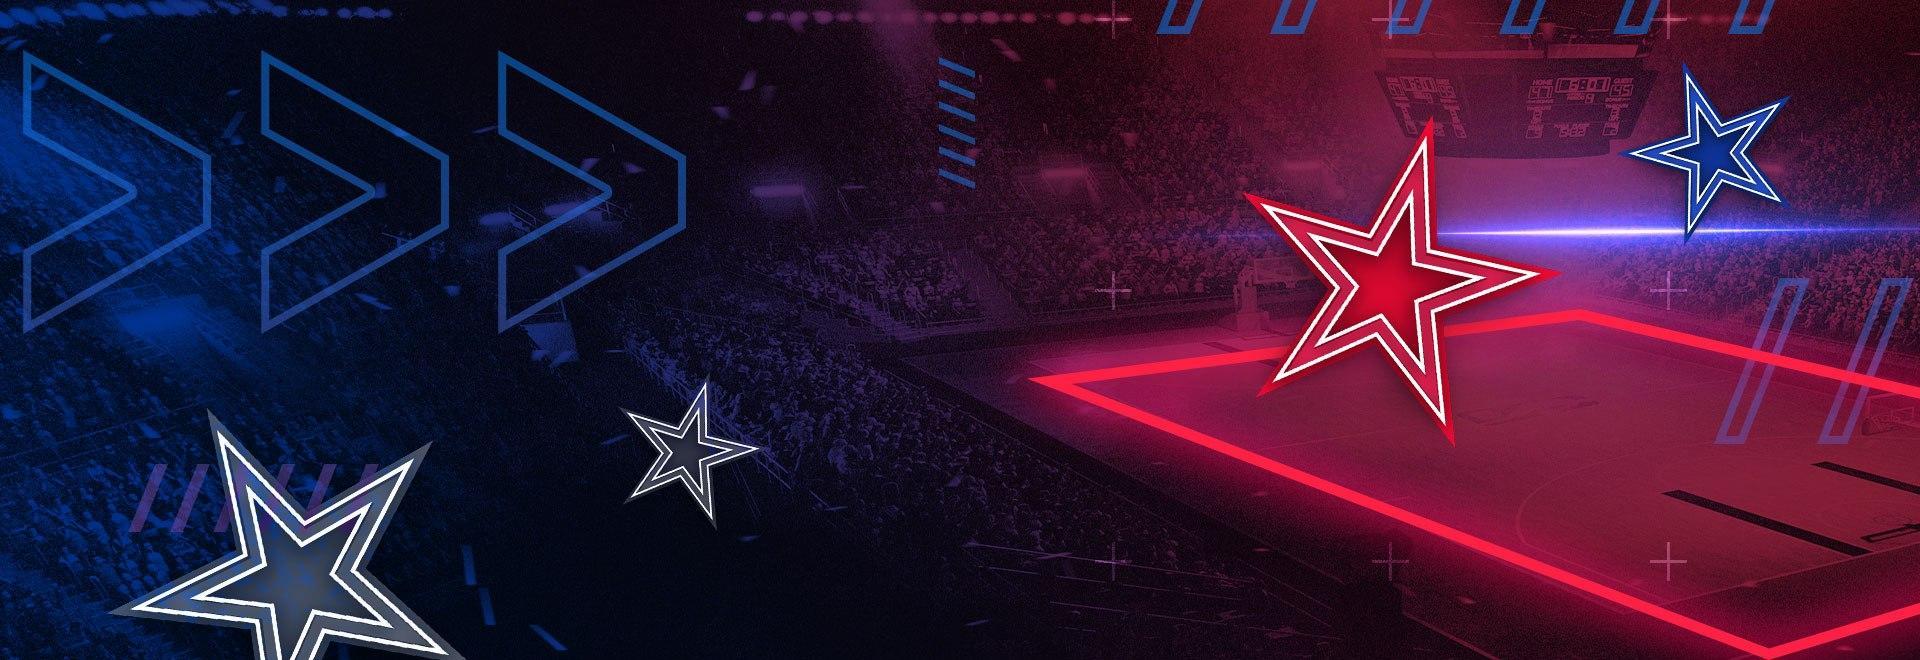 NBA All Star Game 2013